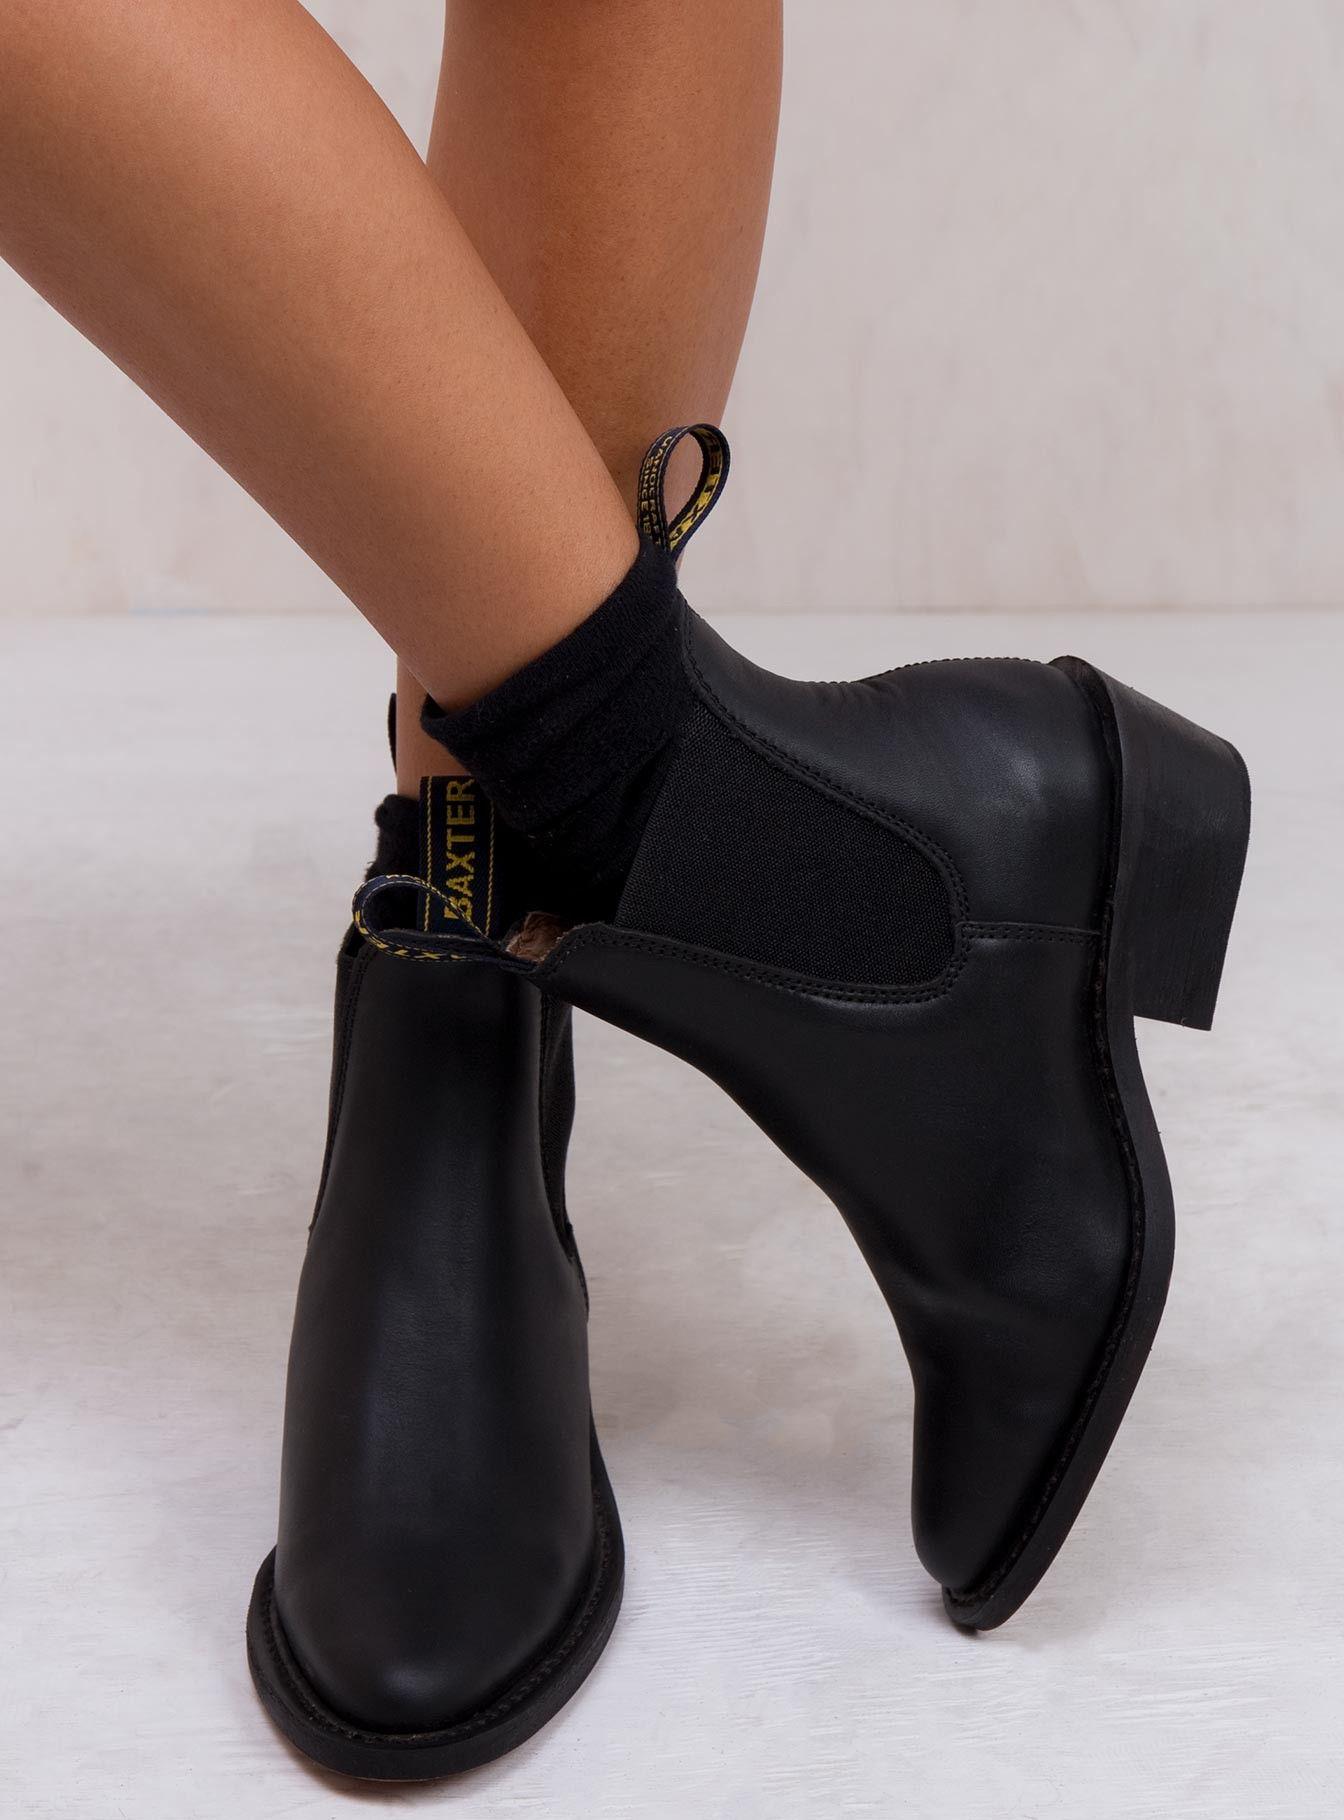 5046159e46f Baxter+Dancer+Boots+Black+-+Dancer+Boots+in+Black+by+Baxter+Footwear ...